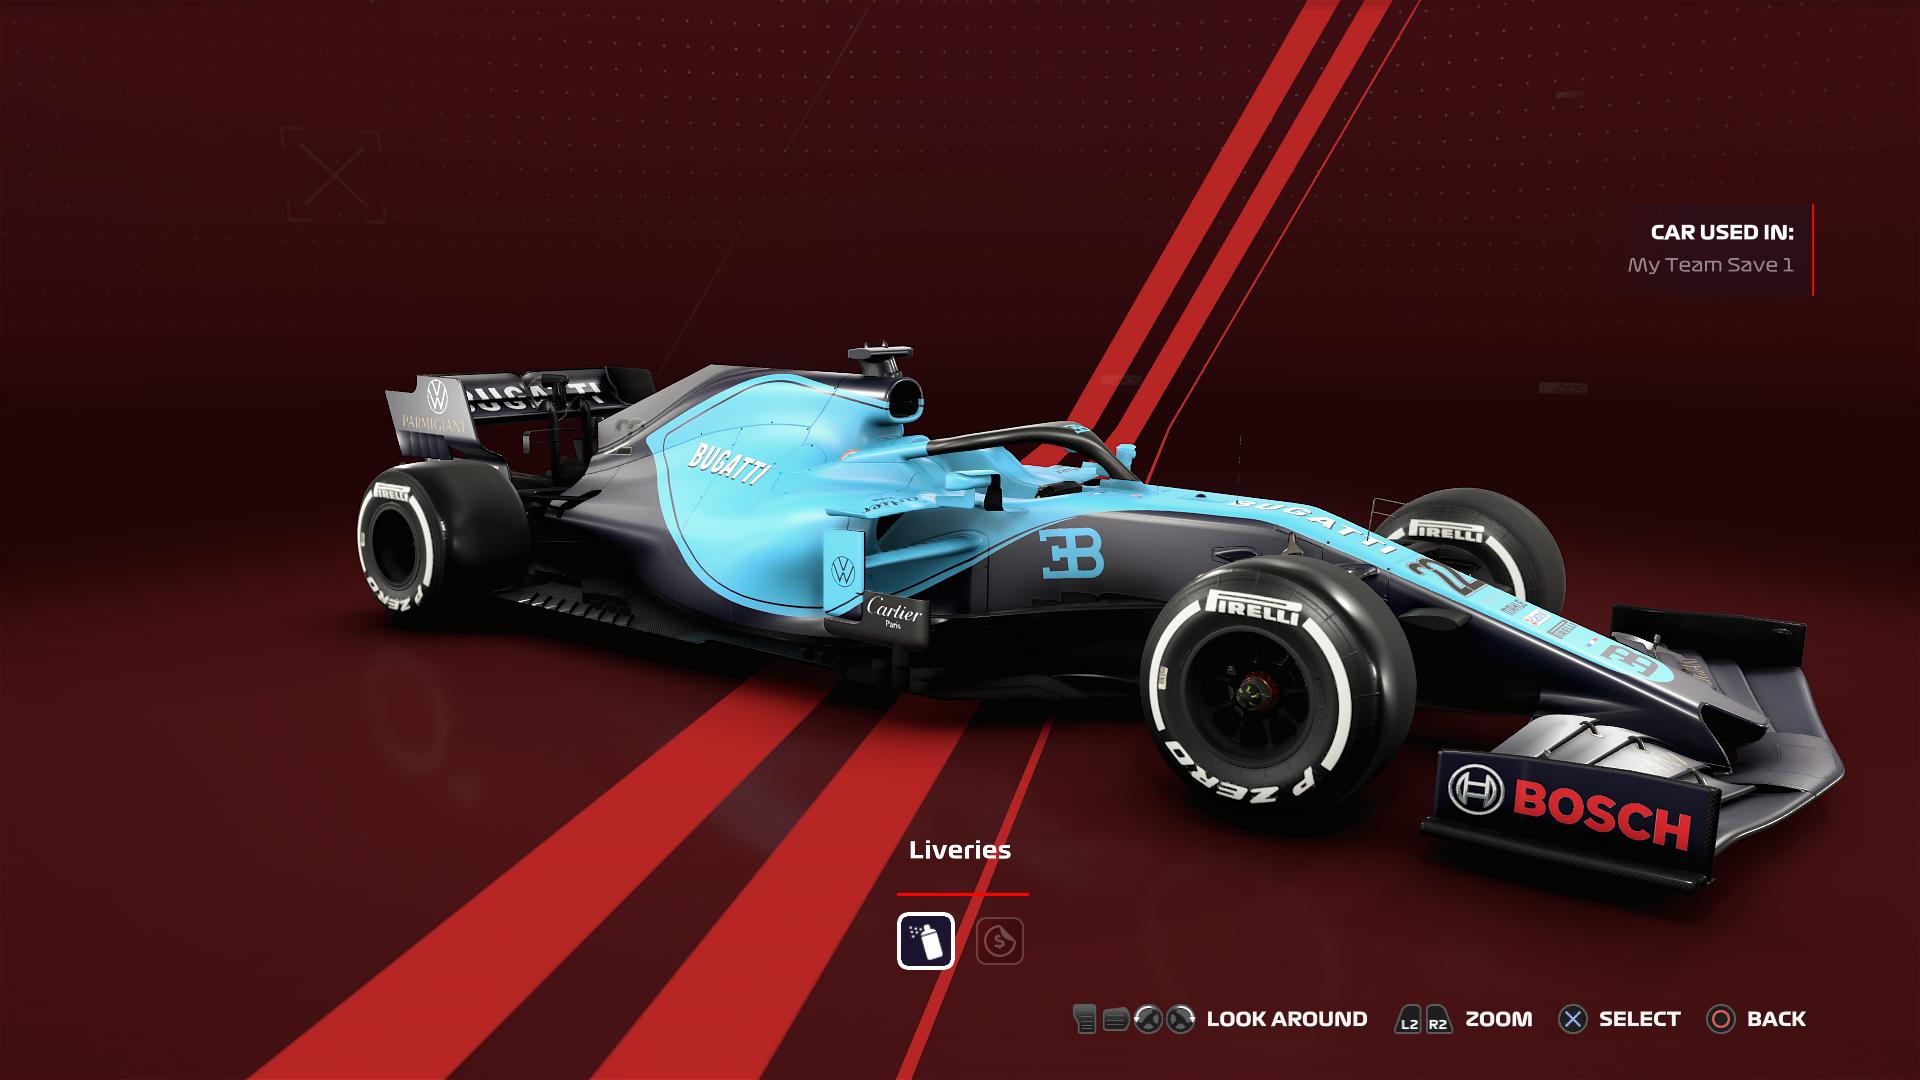 F1 2020 Screenshot 2020.08.20 - 15.01.15.20.png